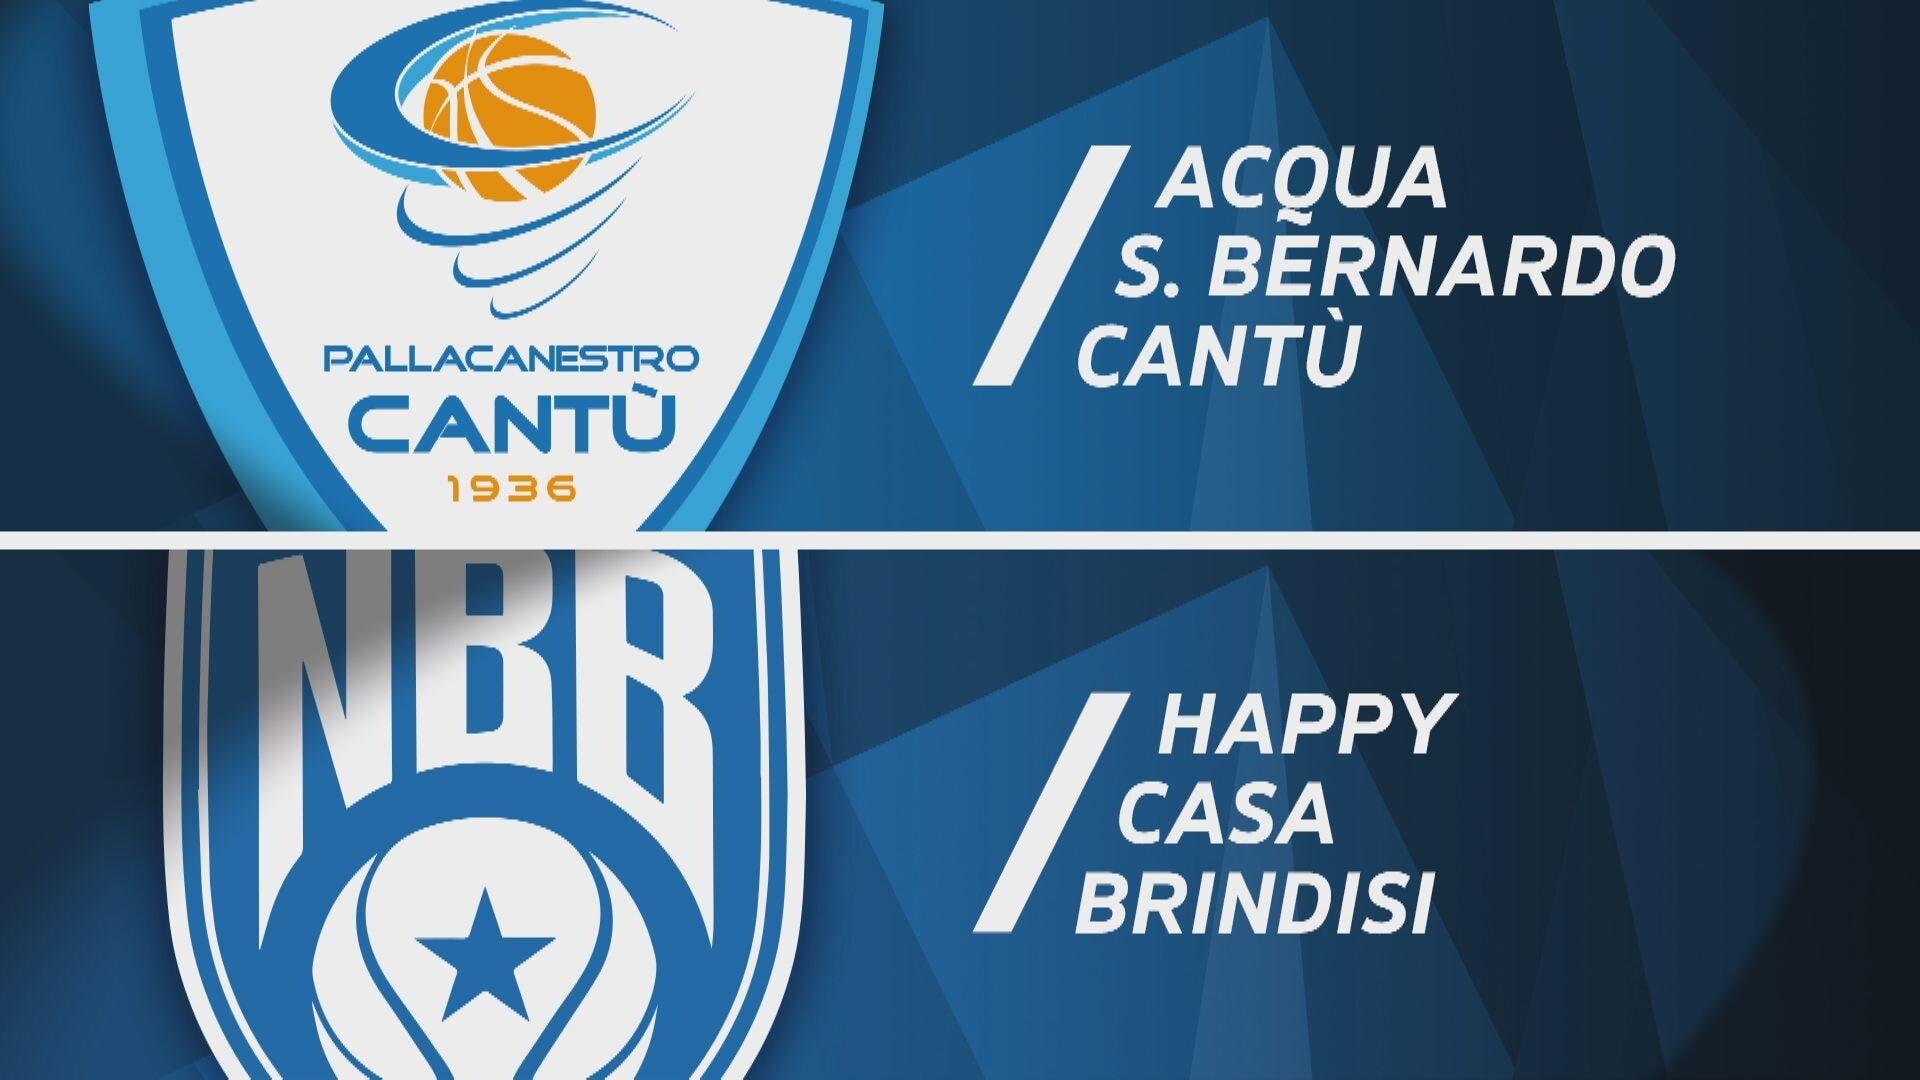 Acqua S.Bernardo Cantù - Happy Casa Brindisi 71-93